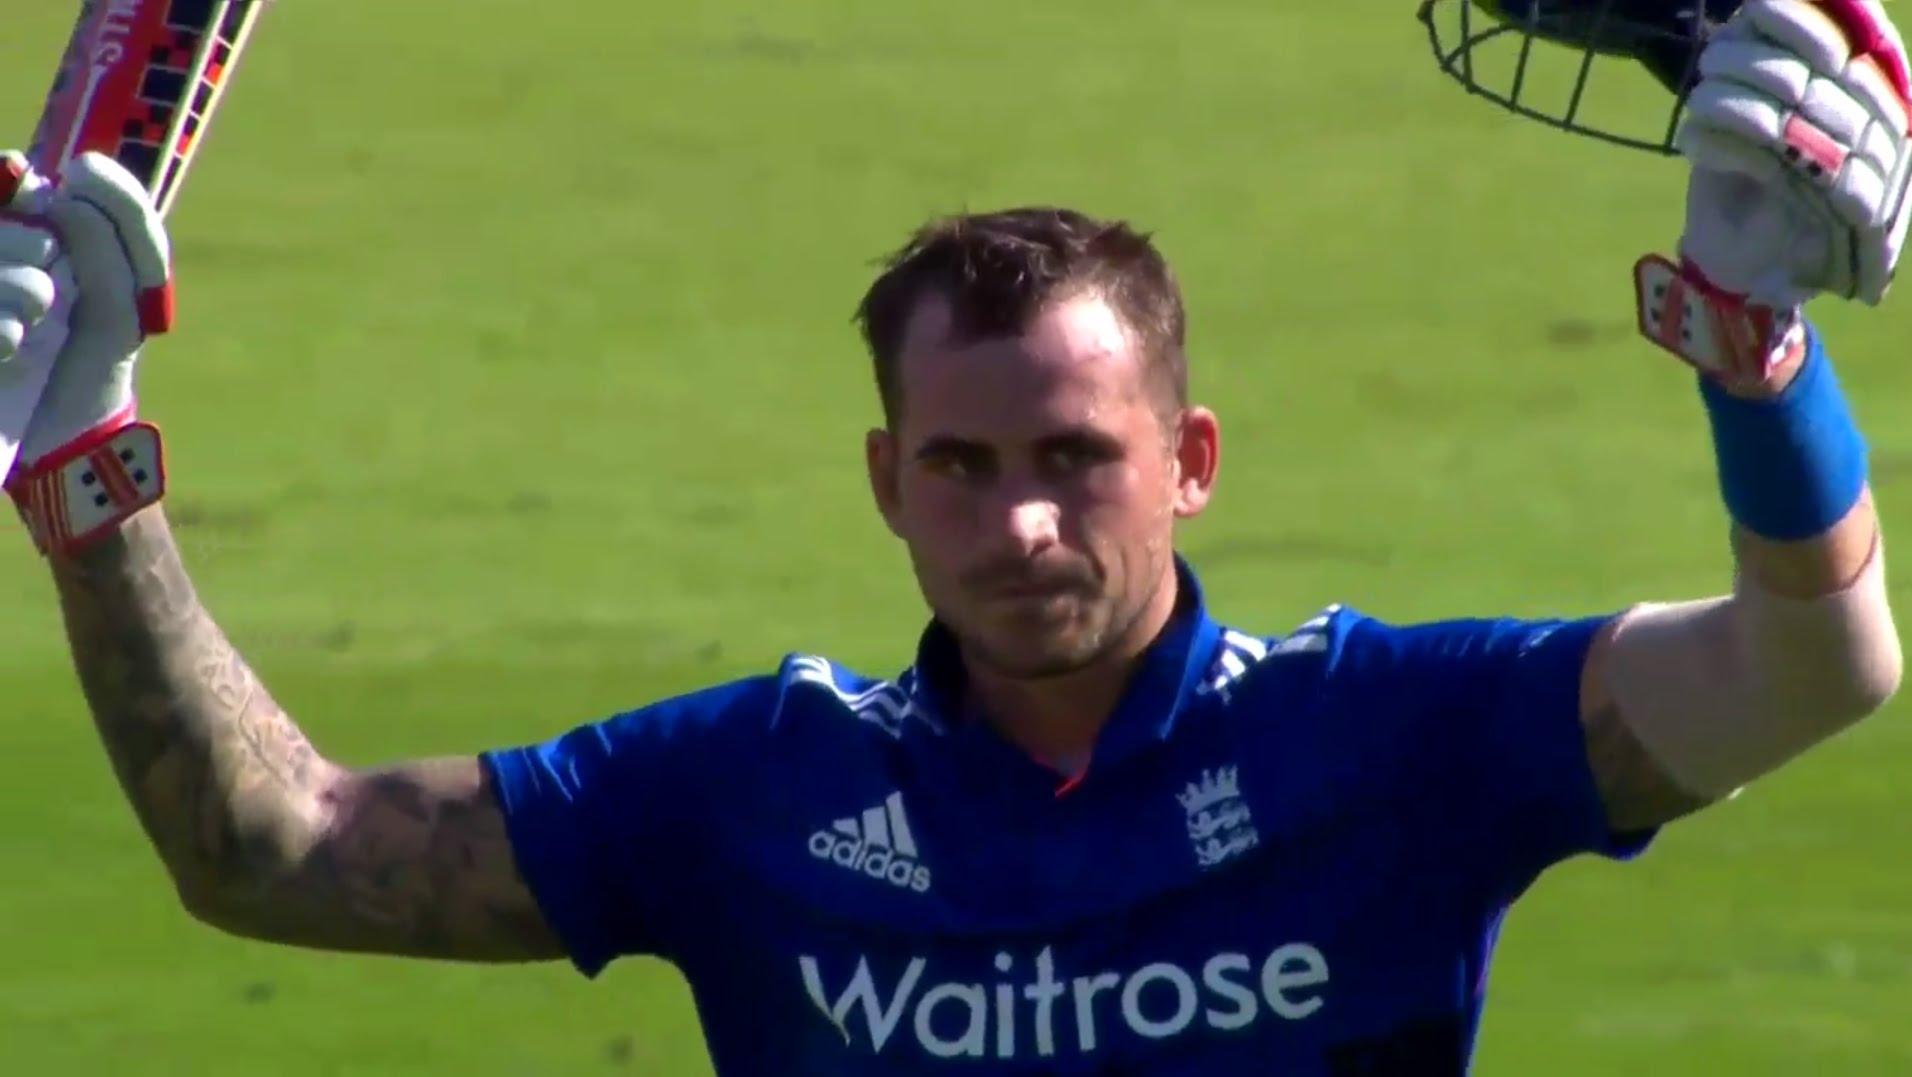 Highlights: England Set ODI Record of 444 Against Pakistan